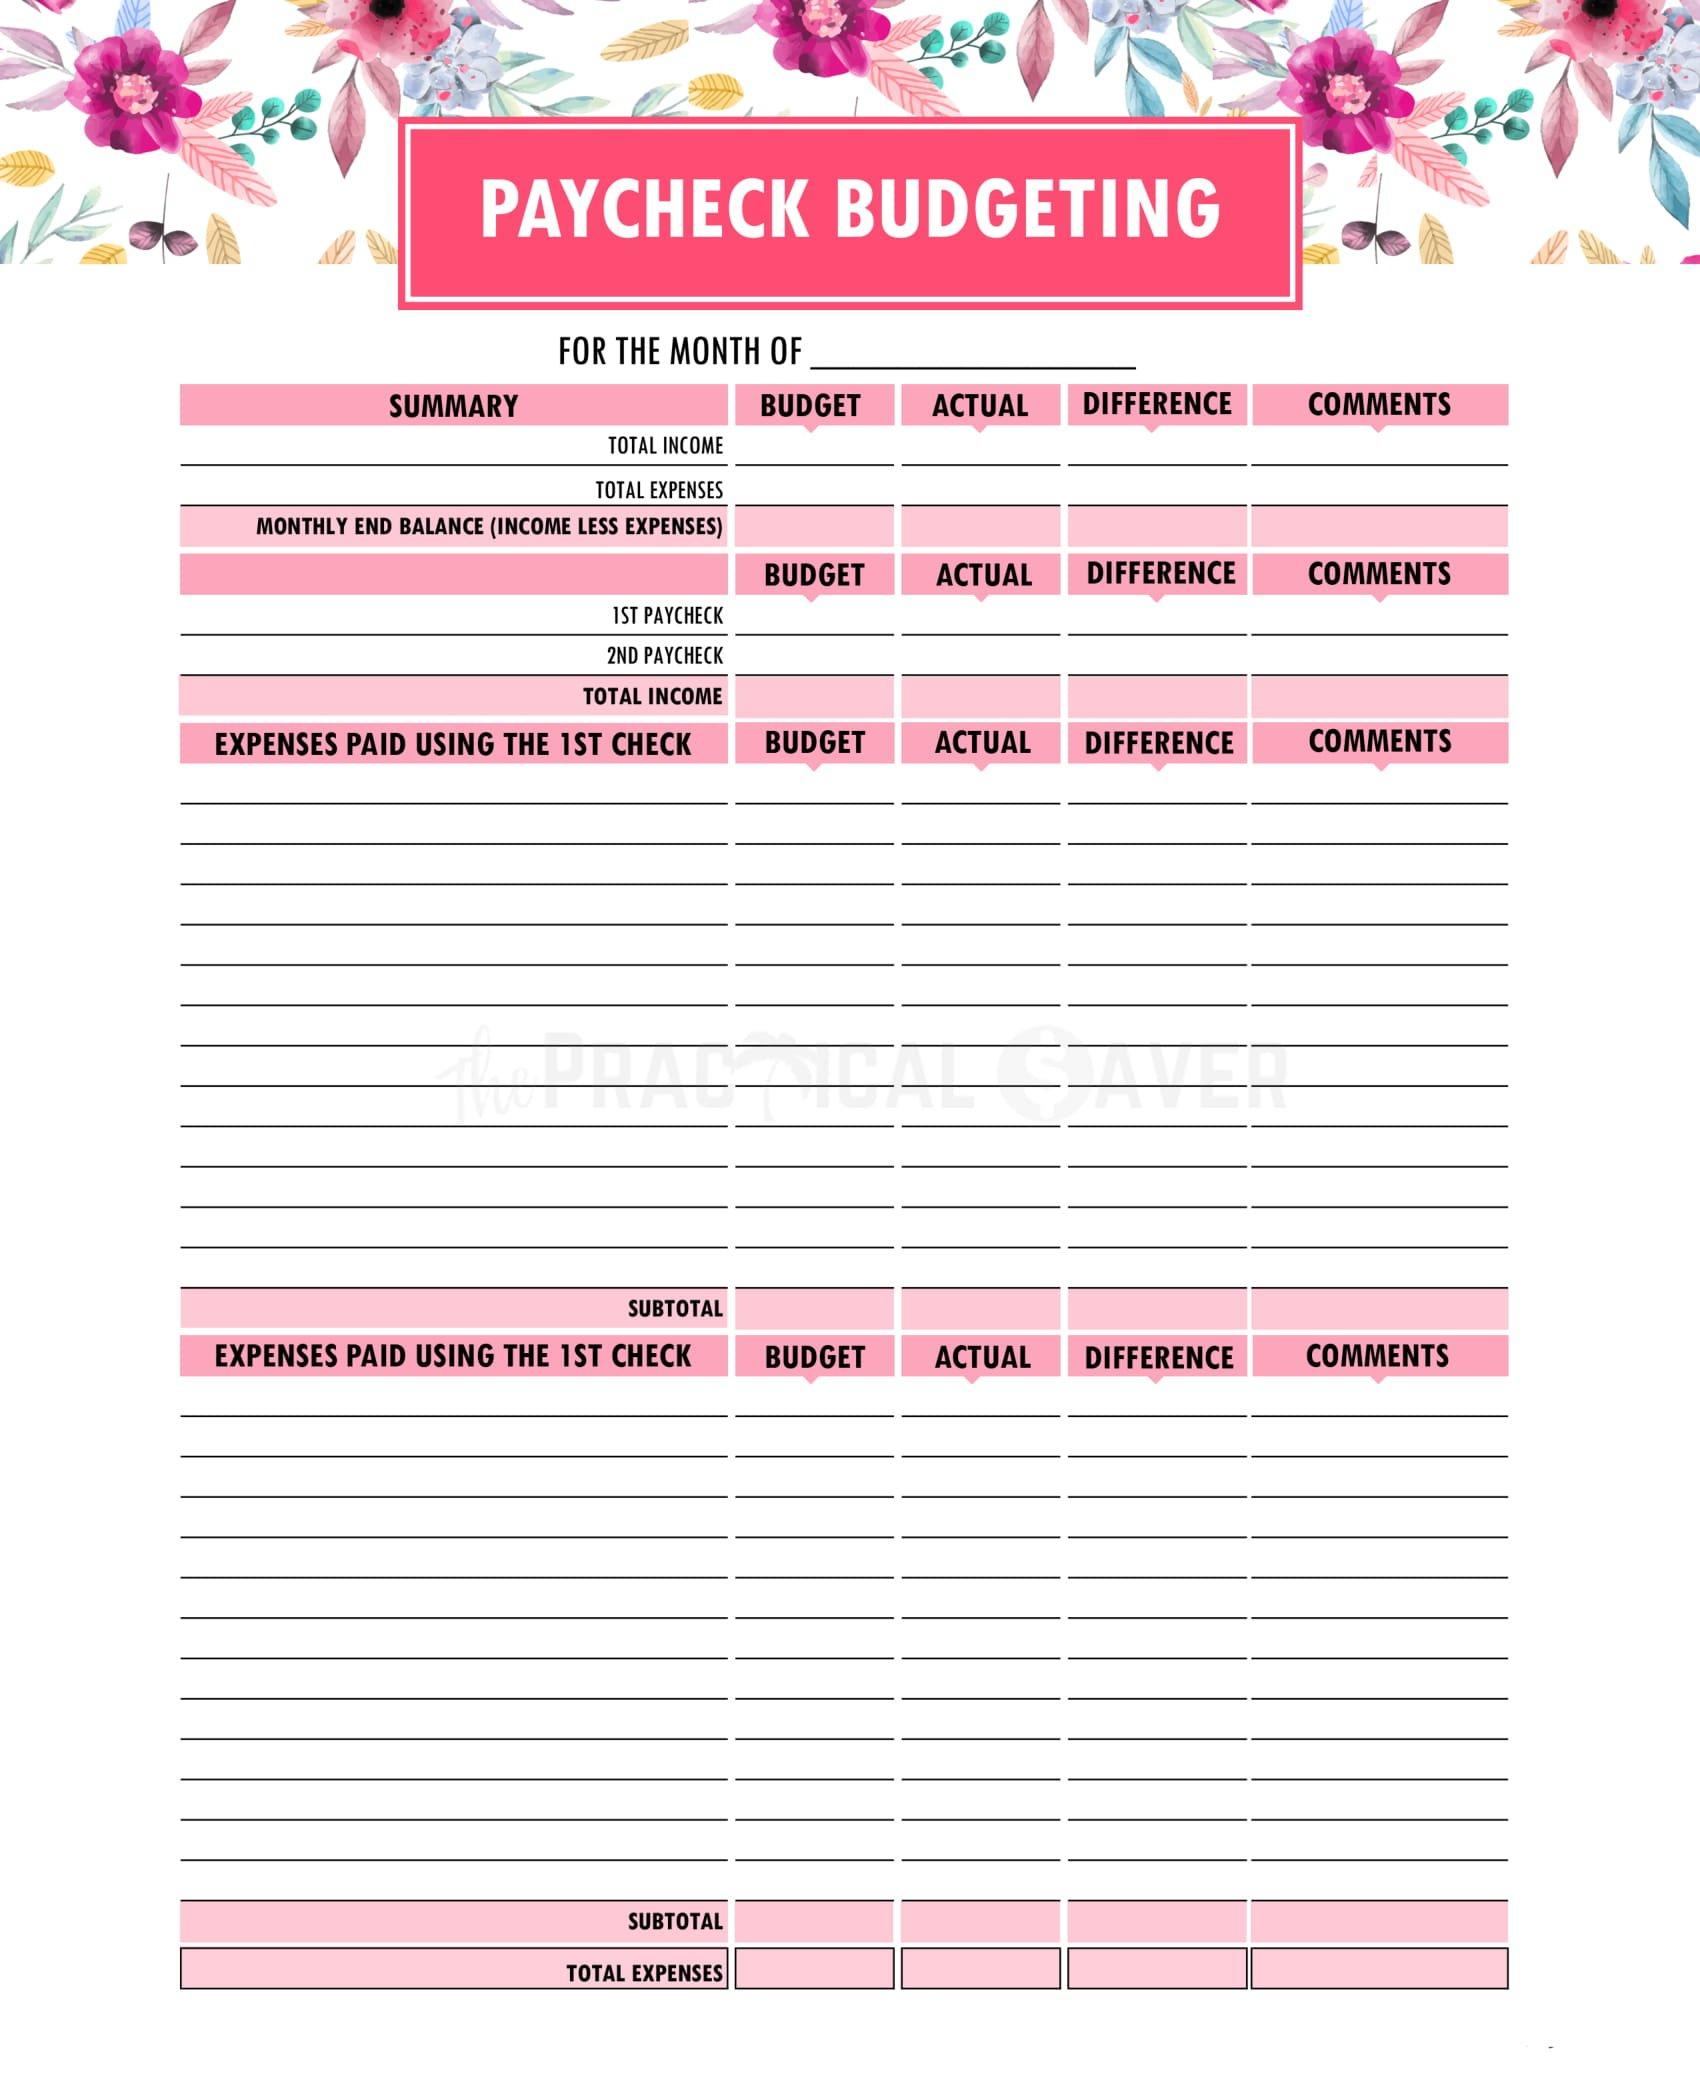 Budget Binder Printables  The Practical Saver Or Free Printable Budget Binder Worksheets